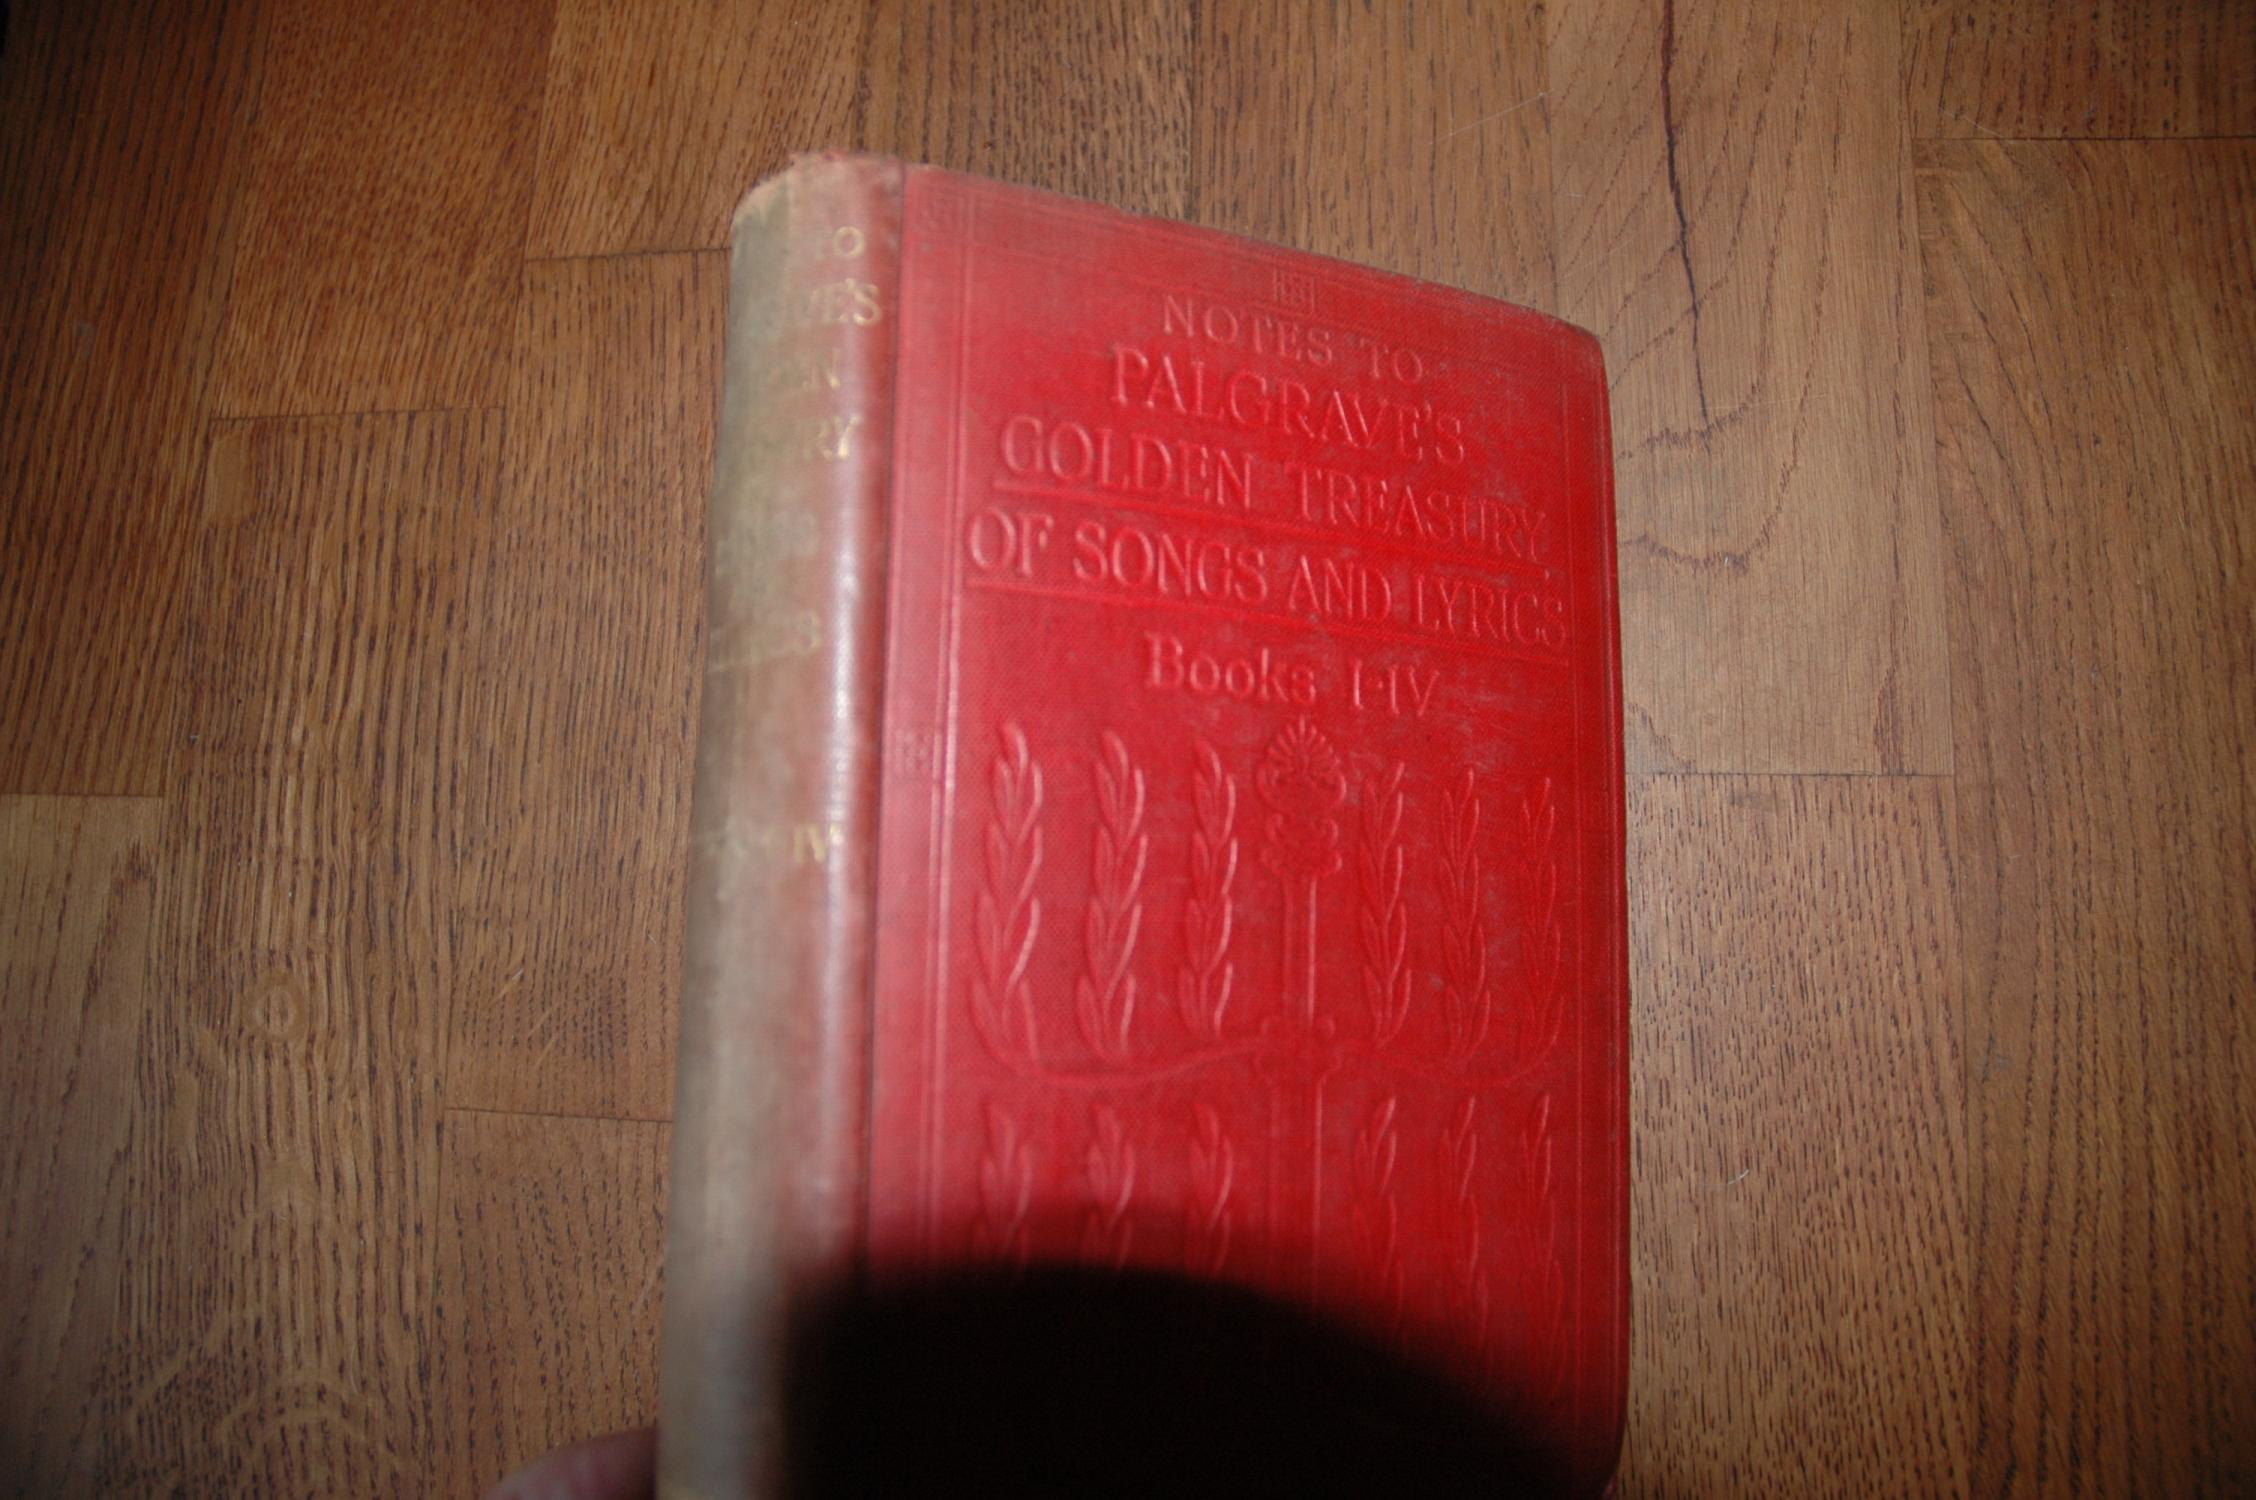 Palgrave's golden treasury wikiwand.